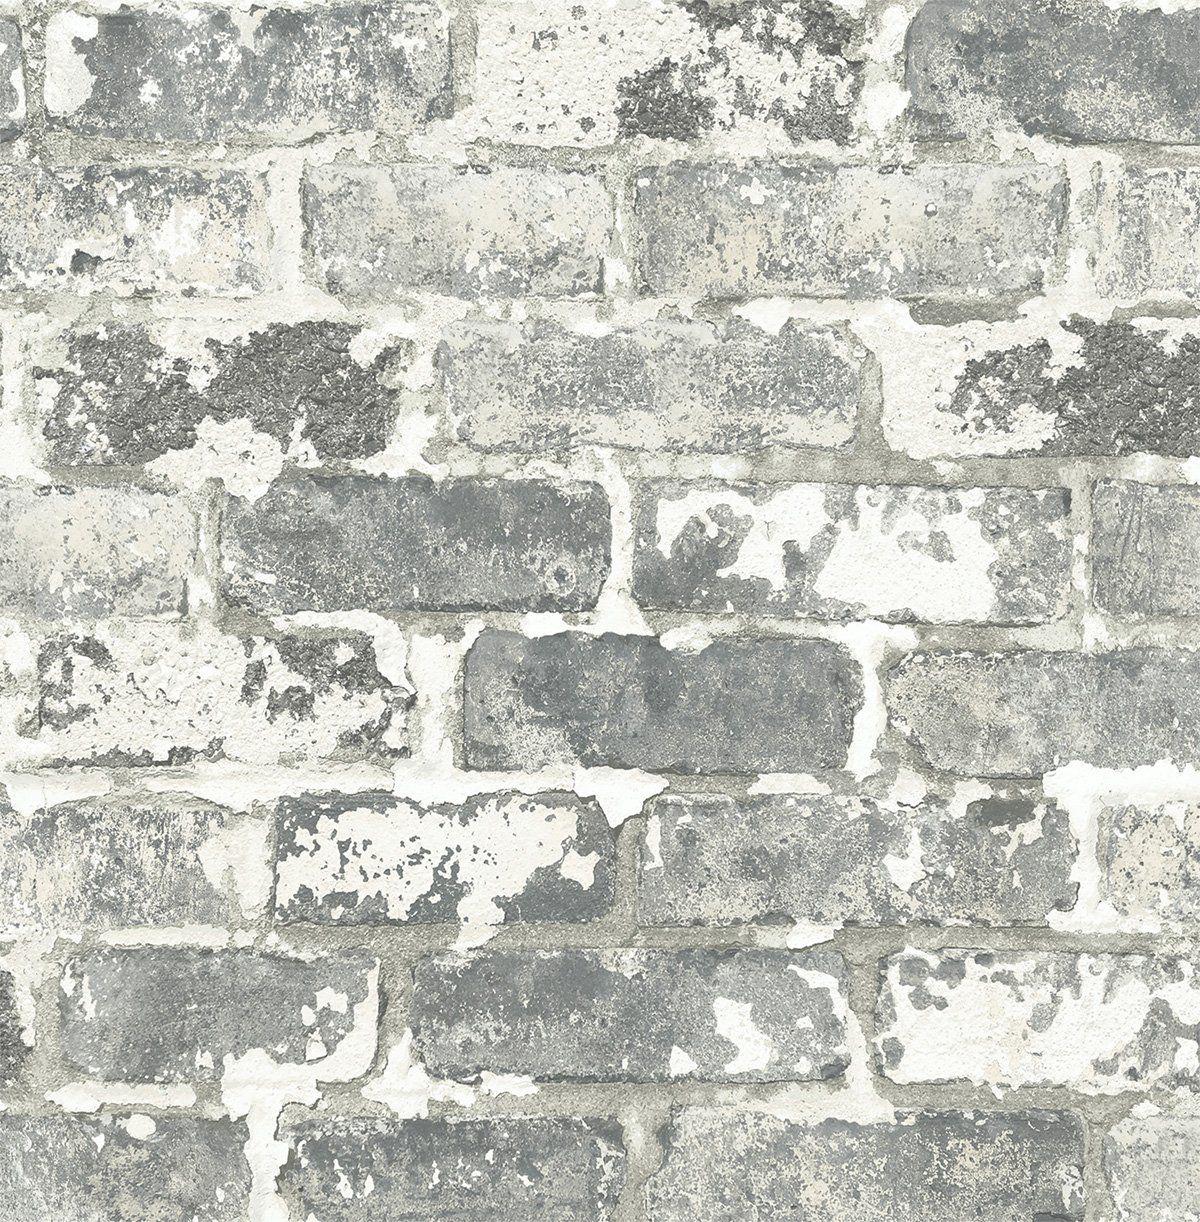 Sample Weathered Grey Brick Peel And Stick Wallpaper By Nextwall Peel And Stick Wallpaper Removable Brick Wallpaper Brick Wallpaper Peel And Stick